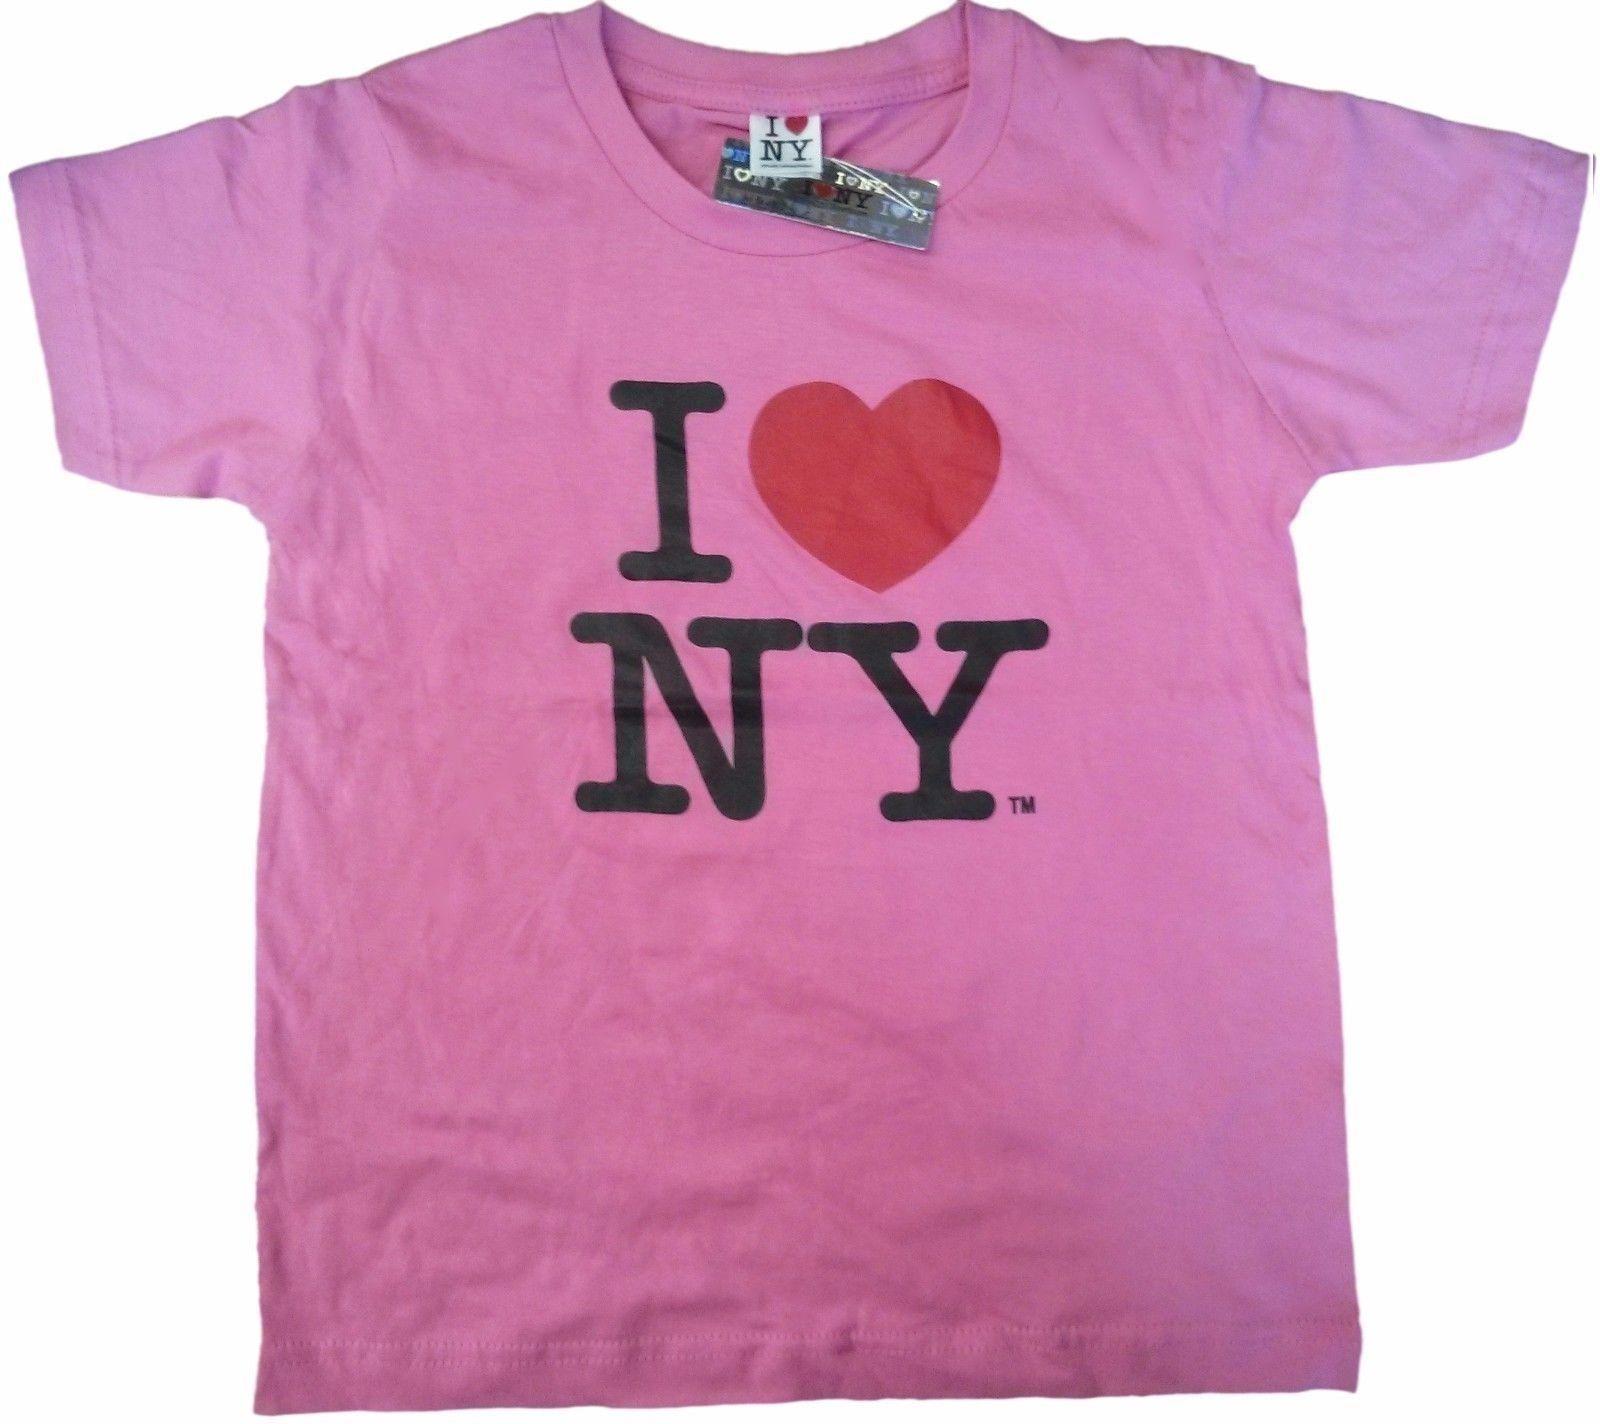 a4e44e9da0d7 I Love NY Kids Short Sleeve Screen Print and 15 similar items